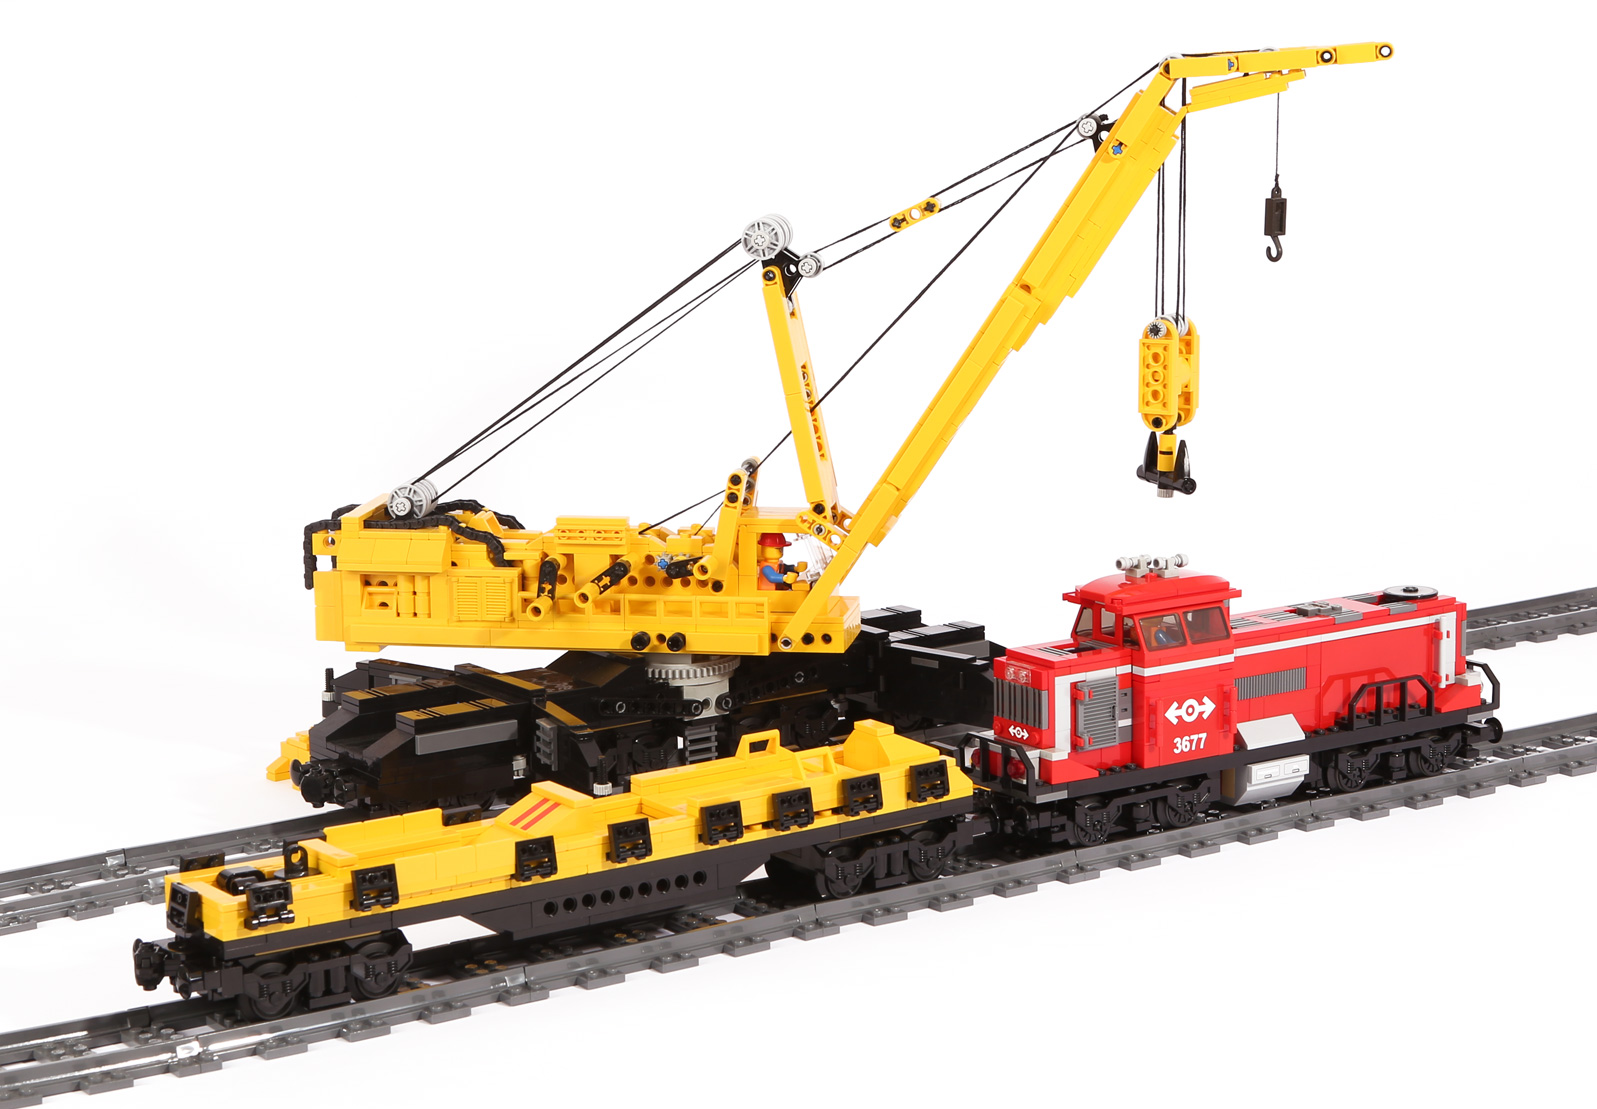 Diesellok-V 100 – Original LEGO Set 3677 (modifizierte Modelle)